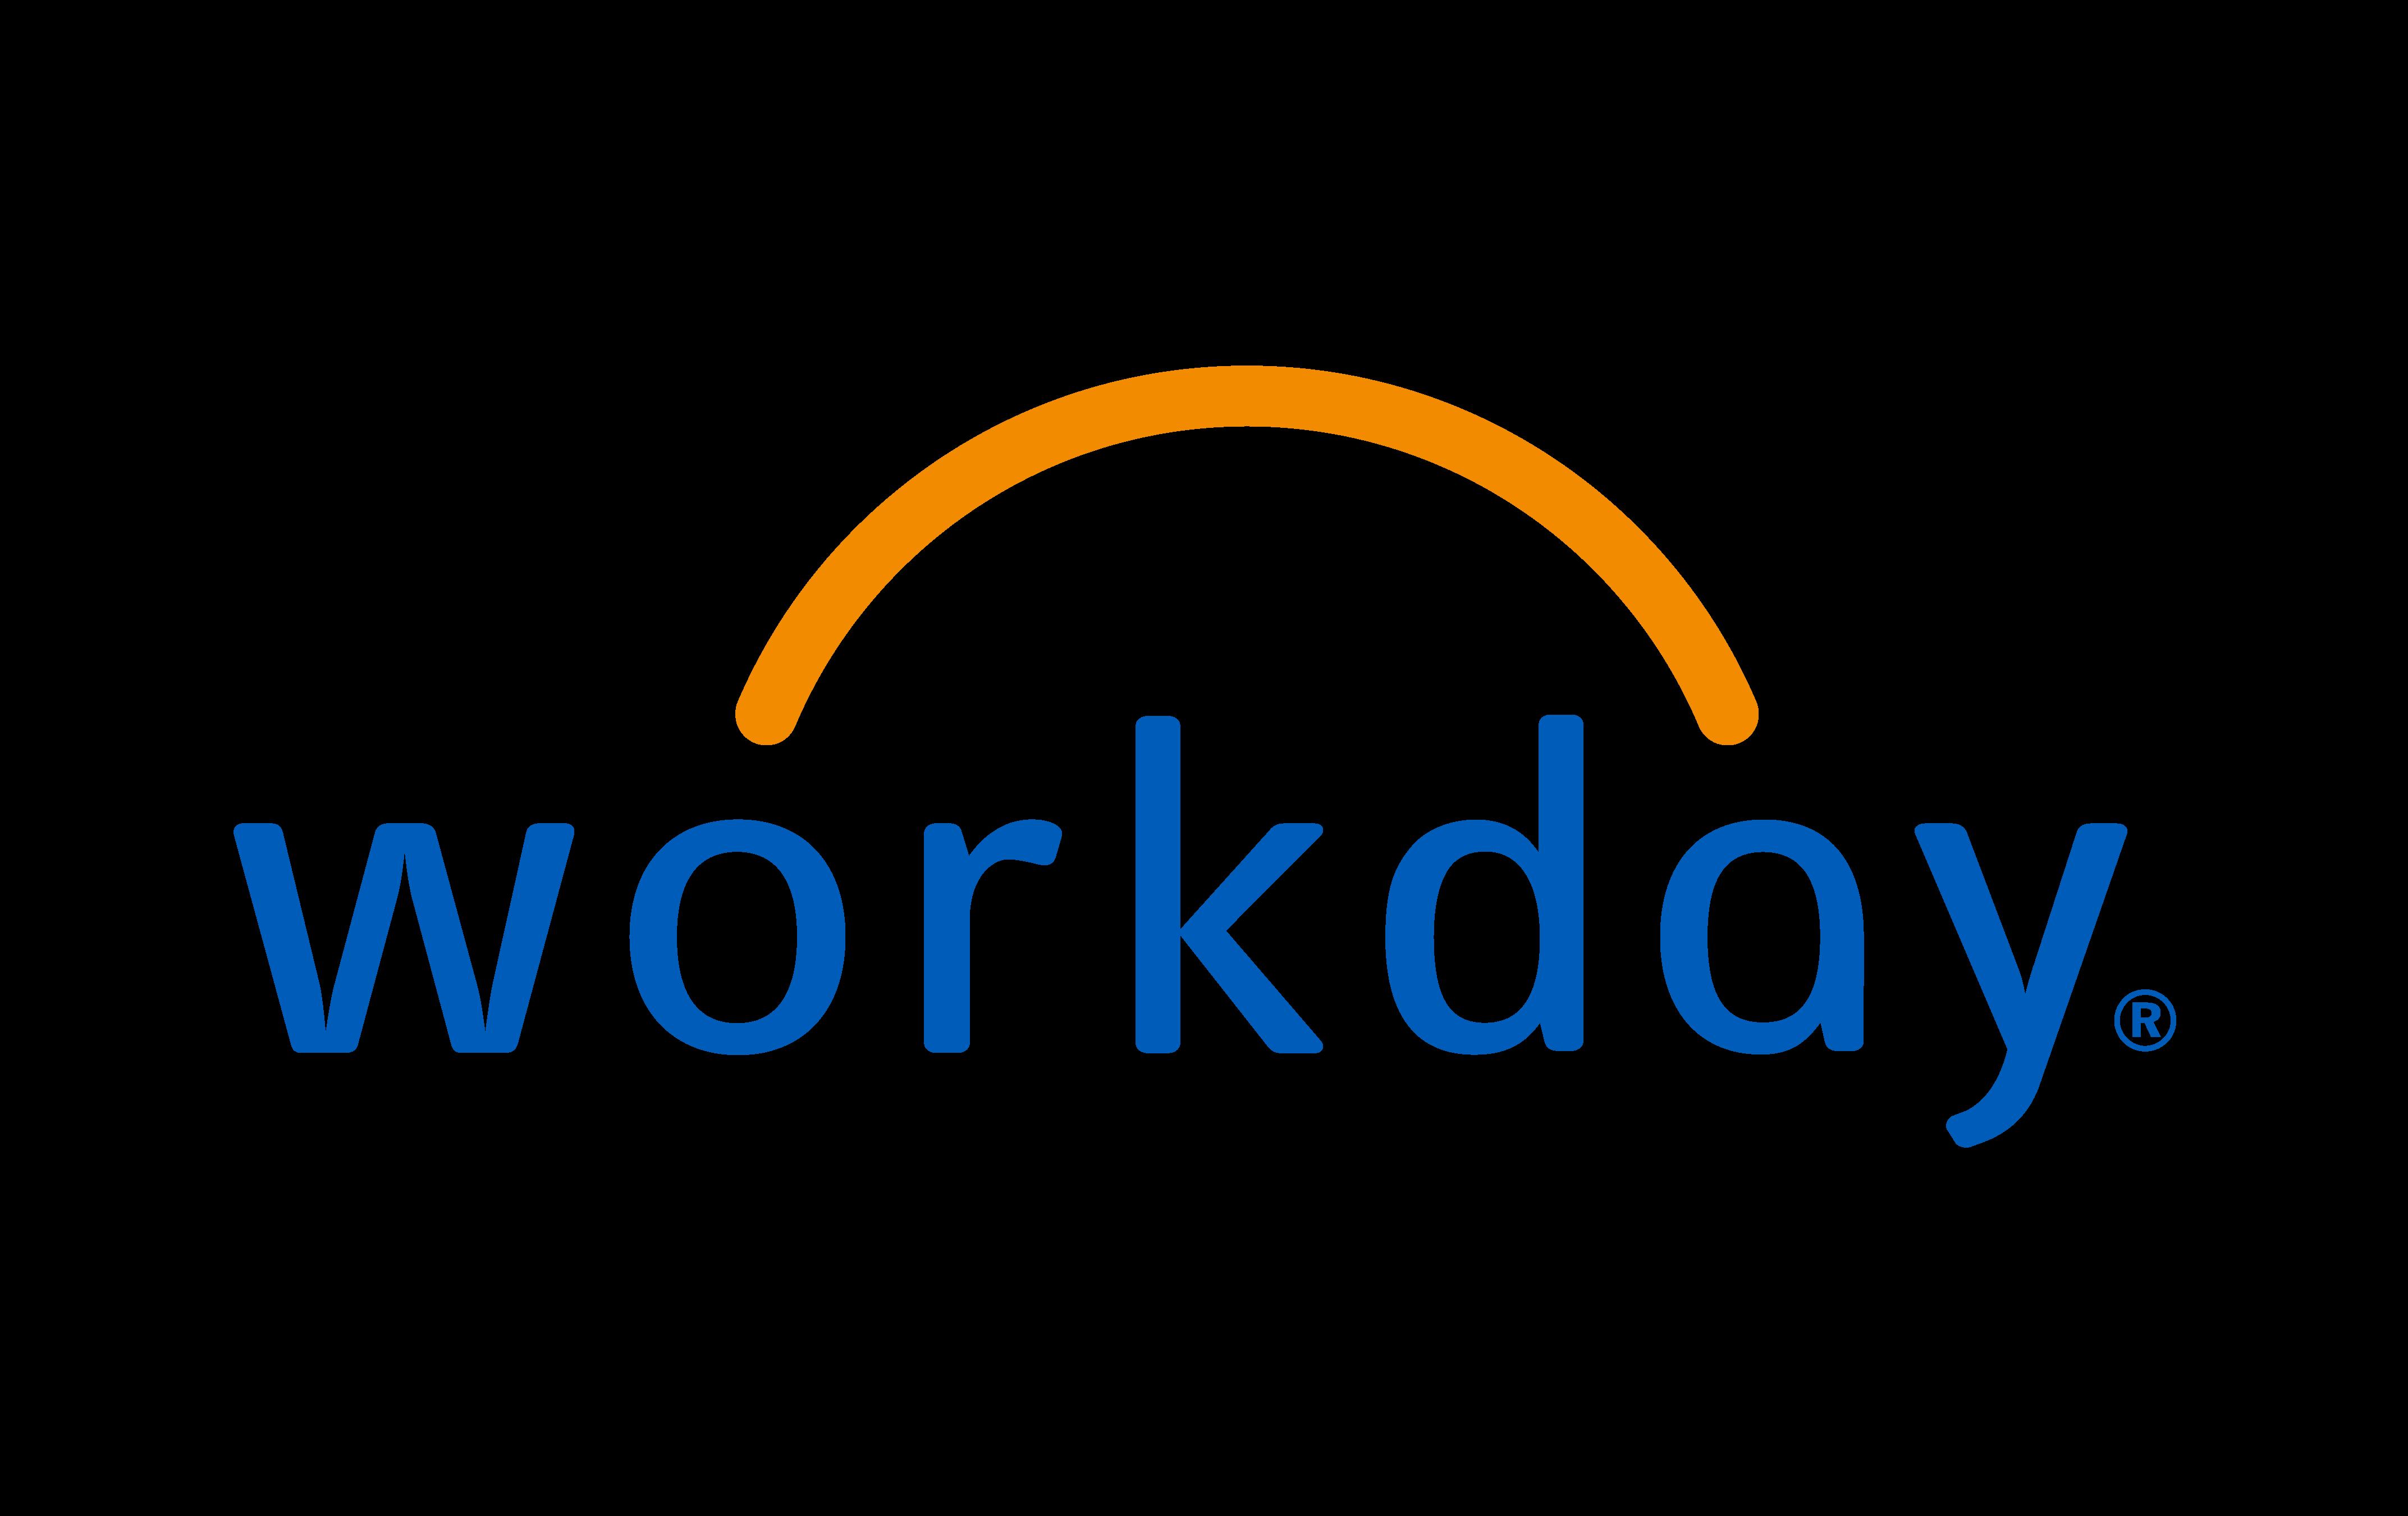 IMGBIN_workday-png_hnRWiEE1